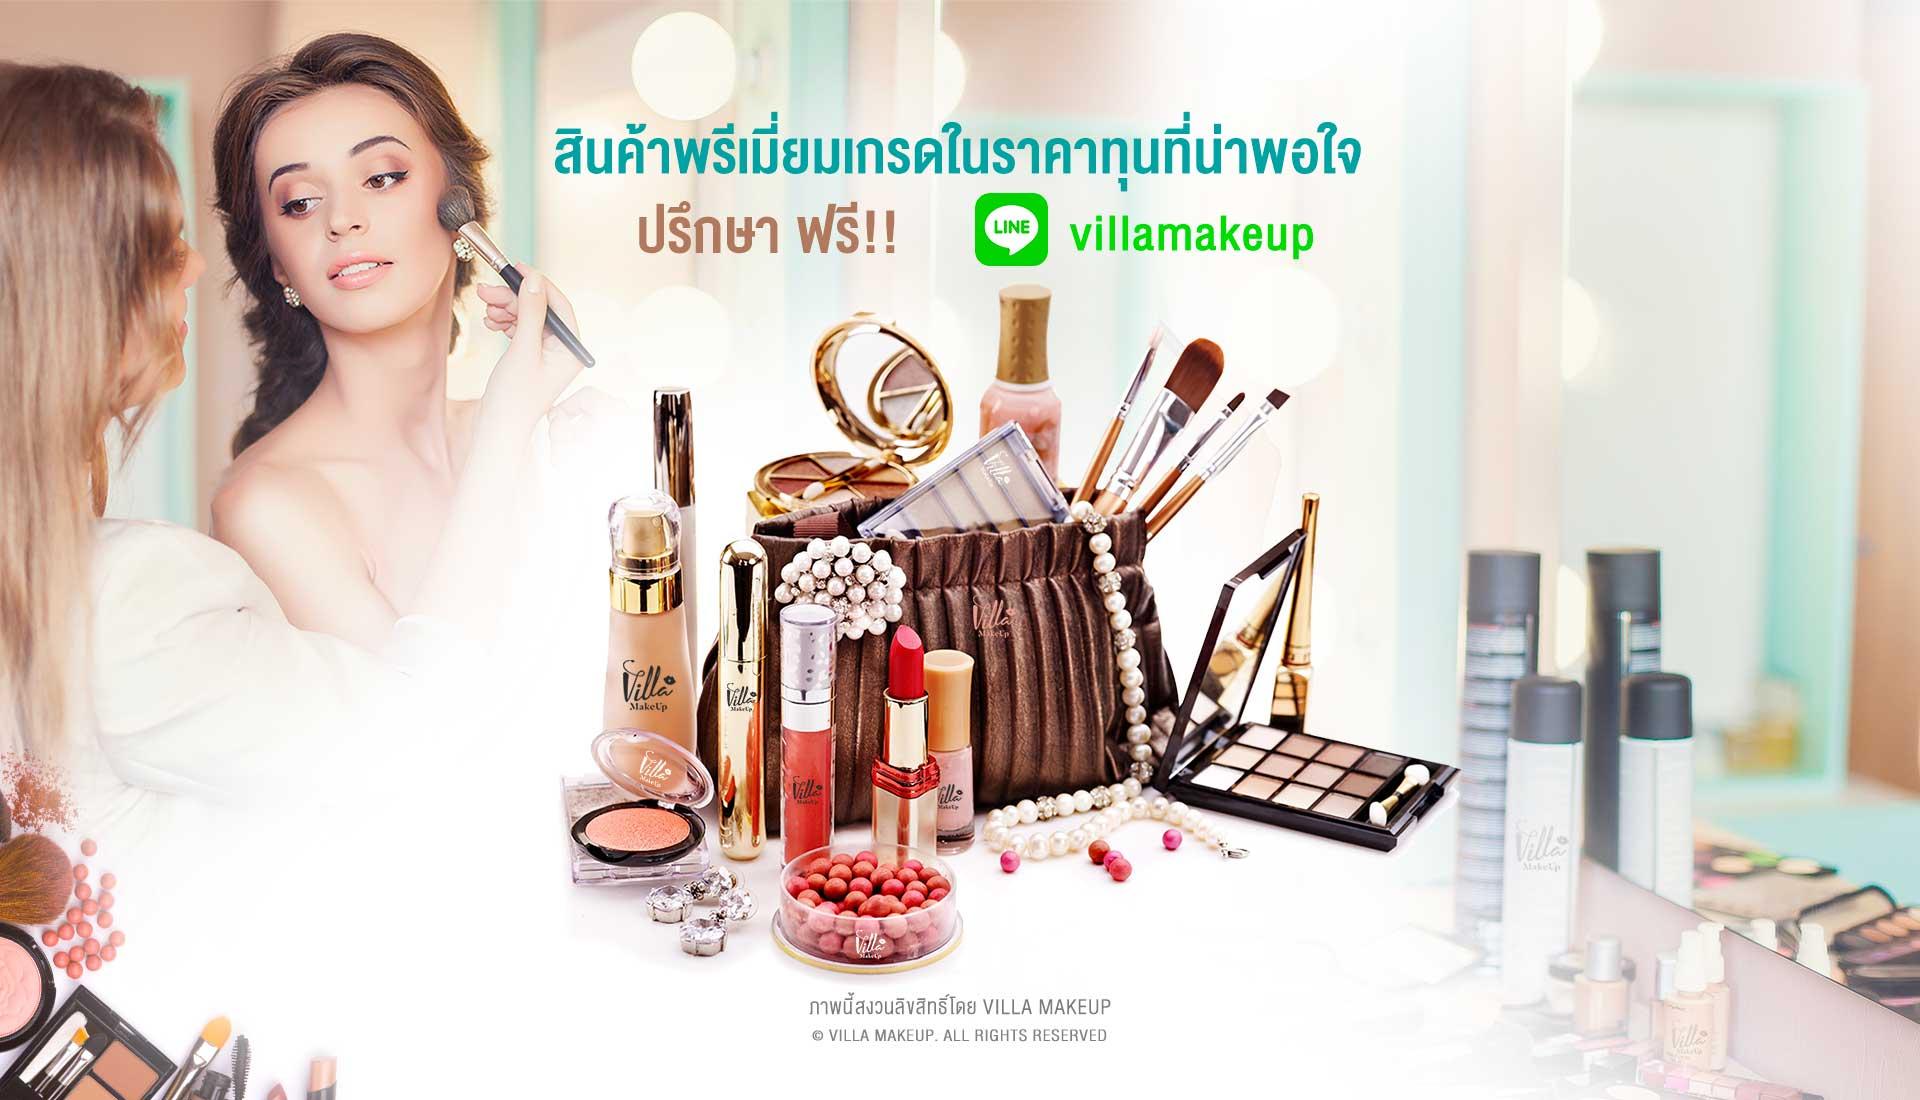 Villa Makeup สินค้าพรีเมี่ยมเกรดในราคาทุนที่น่าพอใจ ปรึกษาฟรี!! Villa Makeup; รับผลิต MAKEUP; Cosmetics; เครื่องสำอาง; เกรด Premium จากเกาหลี; KOREA; OEM/ODM Manufacturer; พร้อมนำเข้าและทำการตลาดแบบ; One Stop Service; บริการออกแบบสินค้าสวยระดับ Counter Brand; ลิปสติก; อายไลน์เนอร์; คอสเมติก; เครื่องสำอาง; เมคอัพ; คู่ชั่น Cushion; แป้งฝุ่น แป้งพัฟ; ดินเขียนคิ้ว มาสคาร่า Mascara; Eyeliner; Eye Brow; รองพื้น; พาเลตต์; หน้า; คอนซีลเลอร์; ไพรเมอร์; บรอนเซอร์; รองพื้น; บลัช; บีบีและคอเรคเตอร์ครีม; ไฮไลท์; แป้ง; คอนทัวร์; ตา; อายไลเนอร์; เมคอัพรีมูฟเวอร์; อายแชโดว์; คิ้ว; อุปกรณ์แต่งตา; ยาทาเล็บ; อายไพรเมอร์และเบส; ขนตาปลอม; มาสคาร่า; ปาก; ลิปเพิ่มริมฝีปากอวบอิ่ม; ลิปสติก; ลิปบาล์มและลิปบำรุงริมฝีปากลิปพาเลท & ลิปเซ็ท; ลิปกลอส; ดินสอเขียนขอบปาก; เมคอัพพาเลทและเมคอัพเซ็ท; พาเลทเครื่องสำอาง; ลิปดินสอ; แป้งคูชั่น; cushion powder grid; ผลิตเครื่องสำอาง; เครื่องสำอางค์